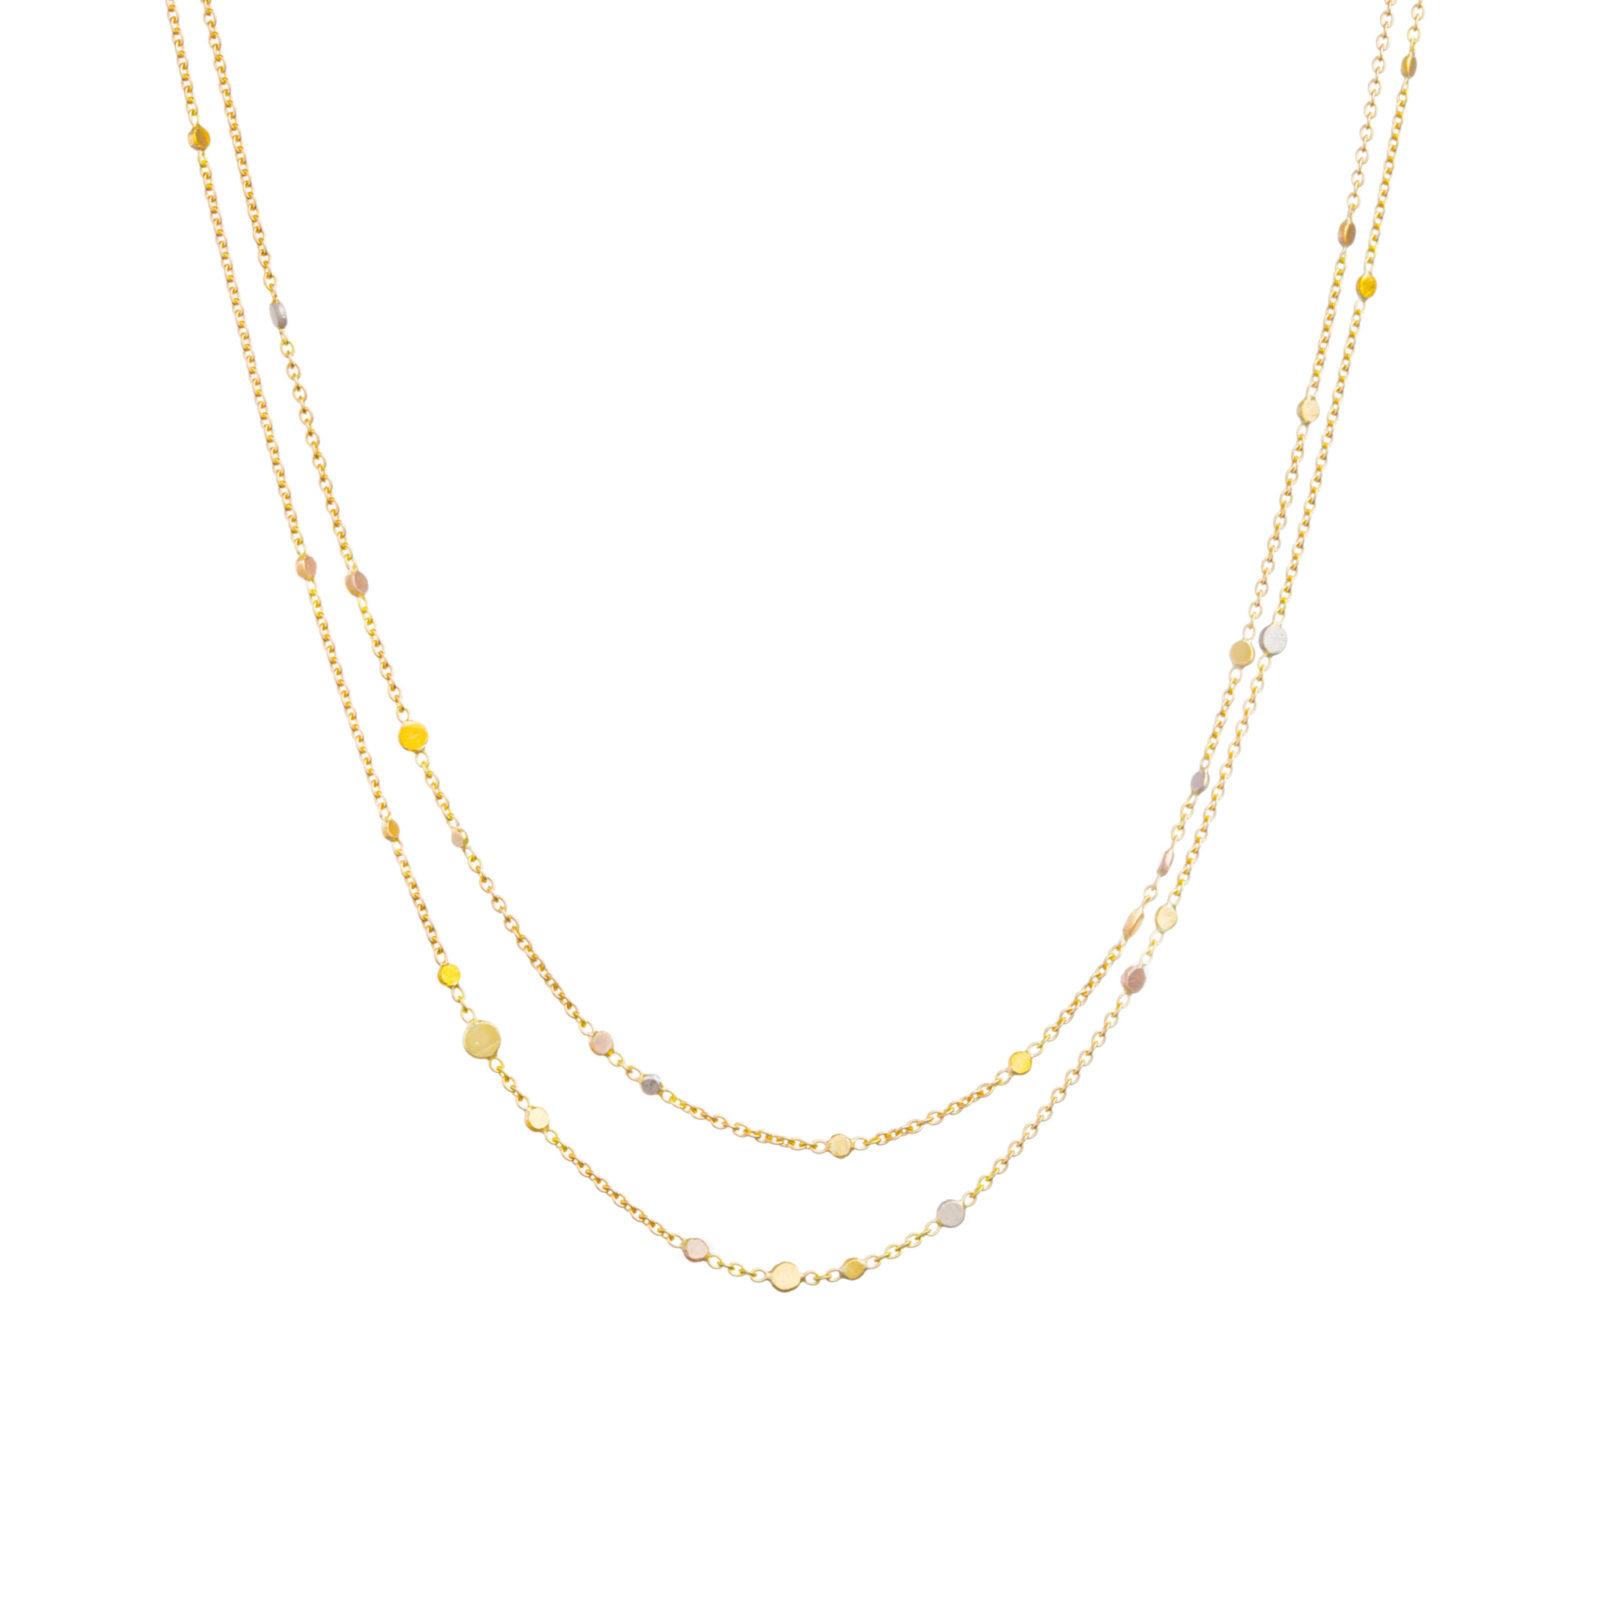 Sia Taylor SN5 RAIN Rainbow Gold Dust Necklace WB